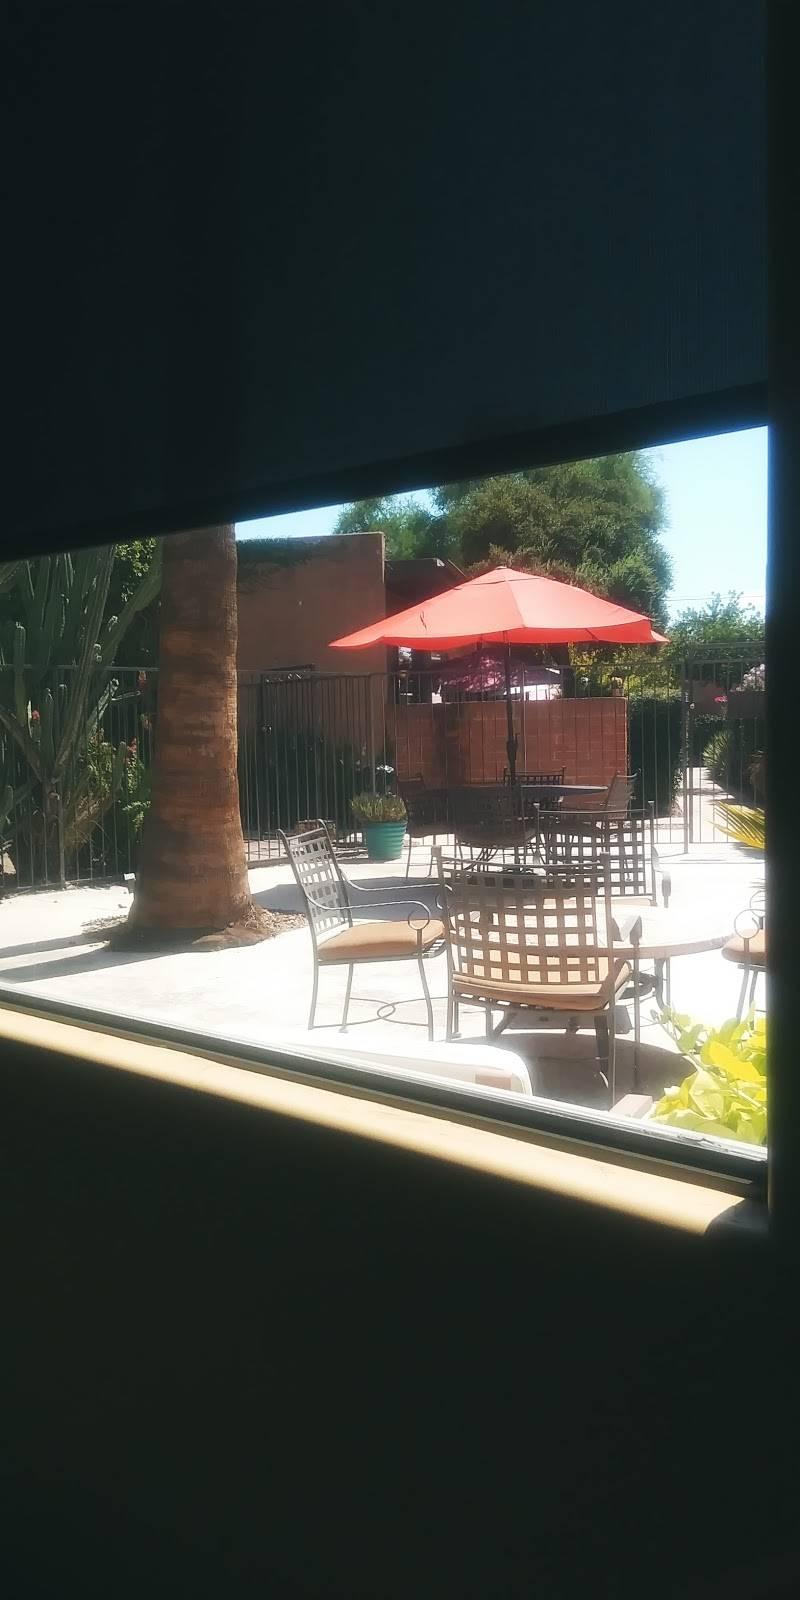 Riverside Suites - real estate agency    Photo 9 of 10   Address: 1725 E Limberlost Dr, Tucson, AZ 85719, USA   Phone: (520) 202-2210